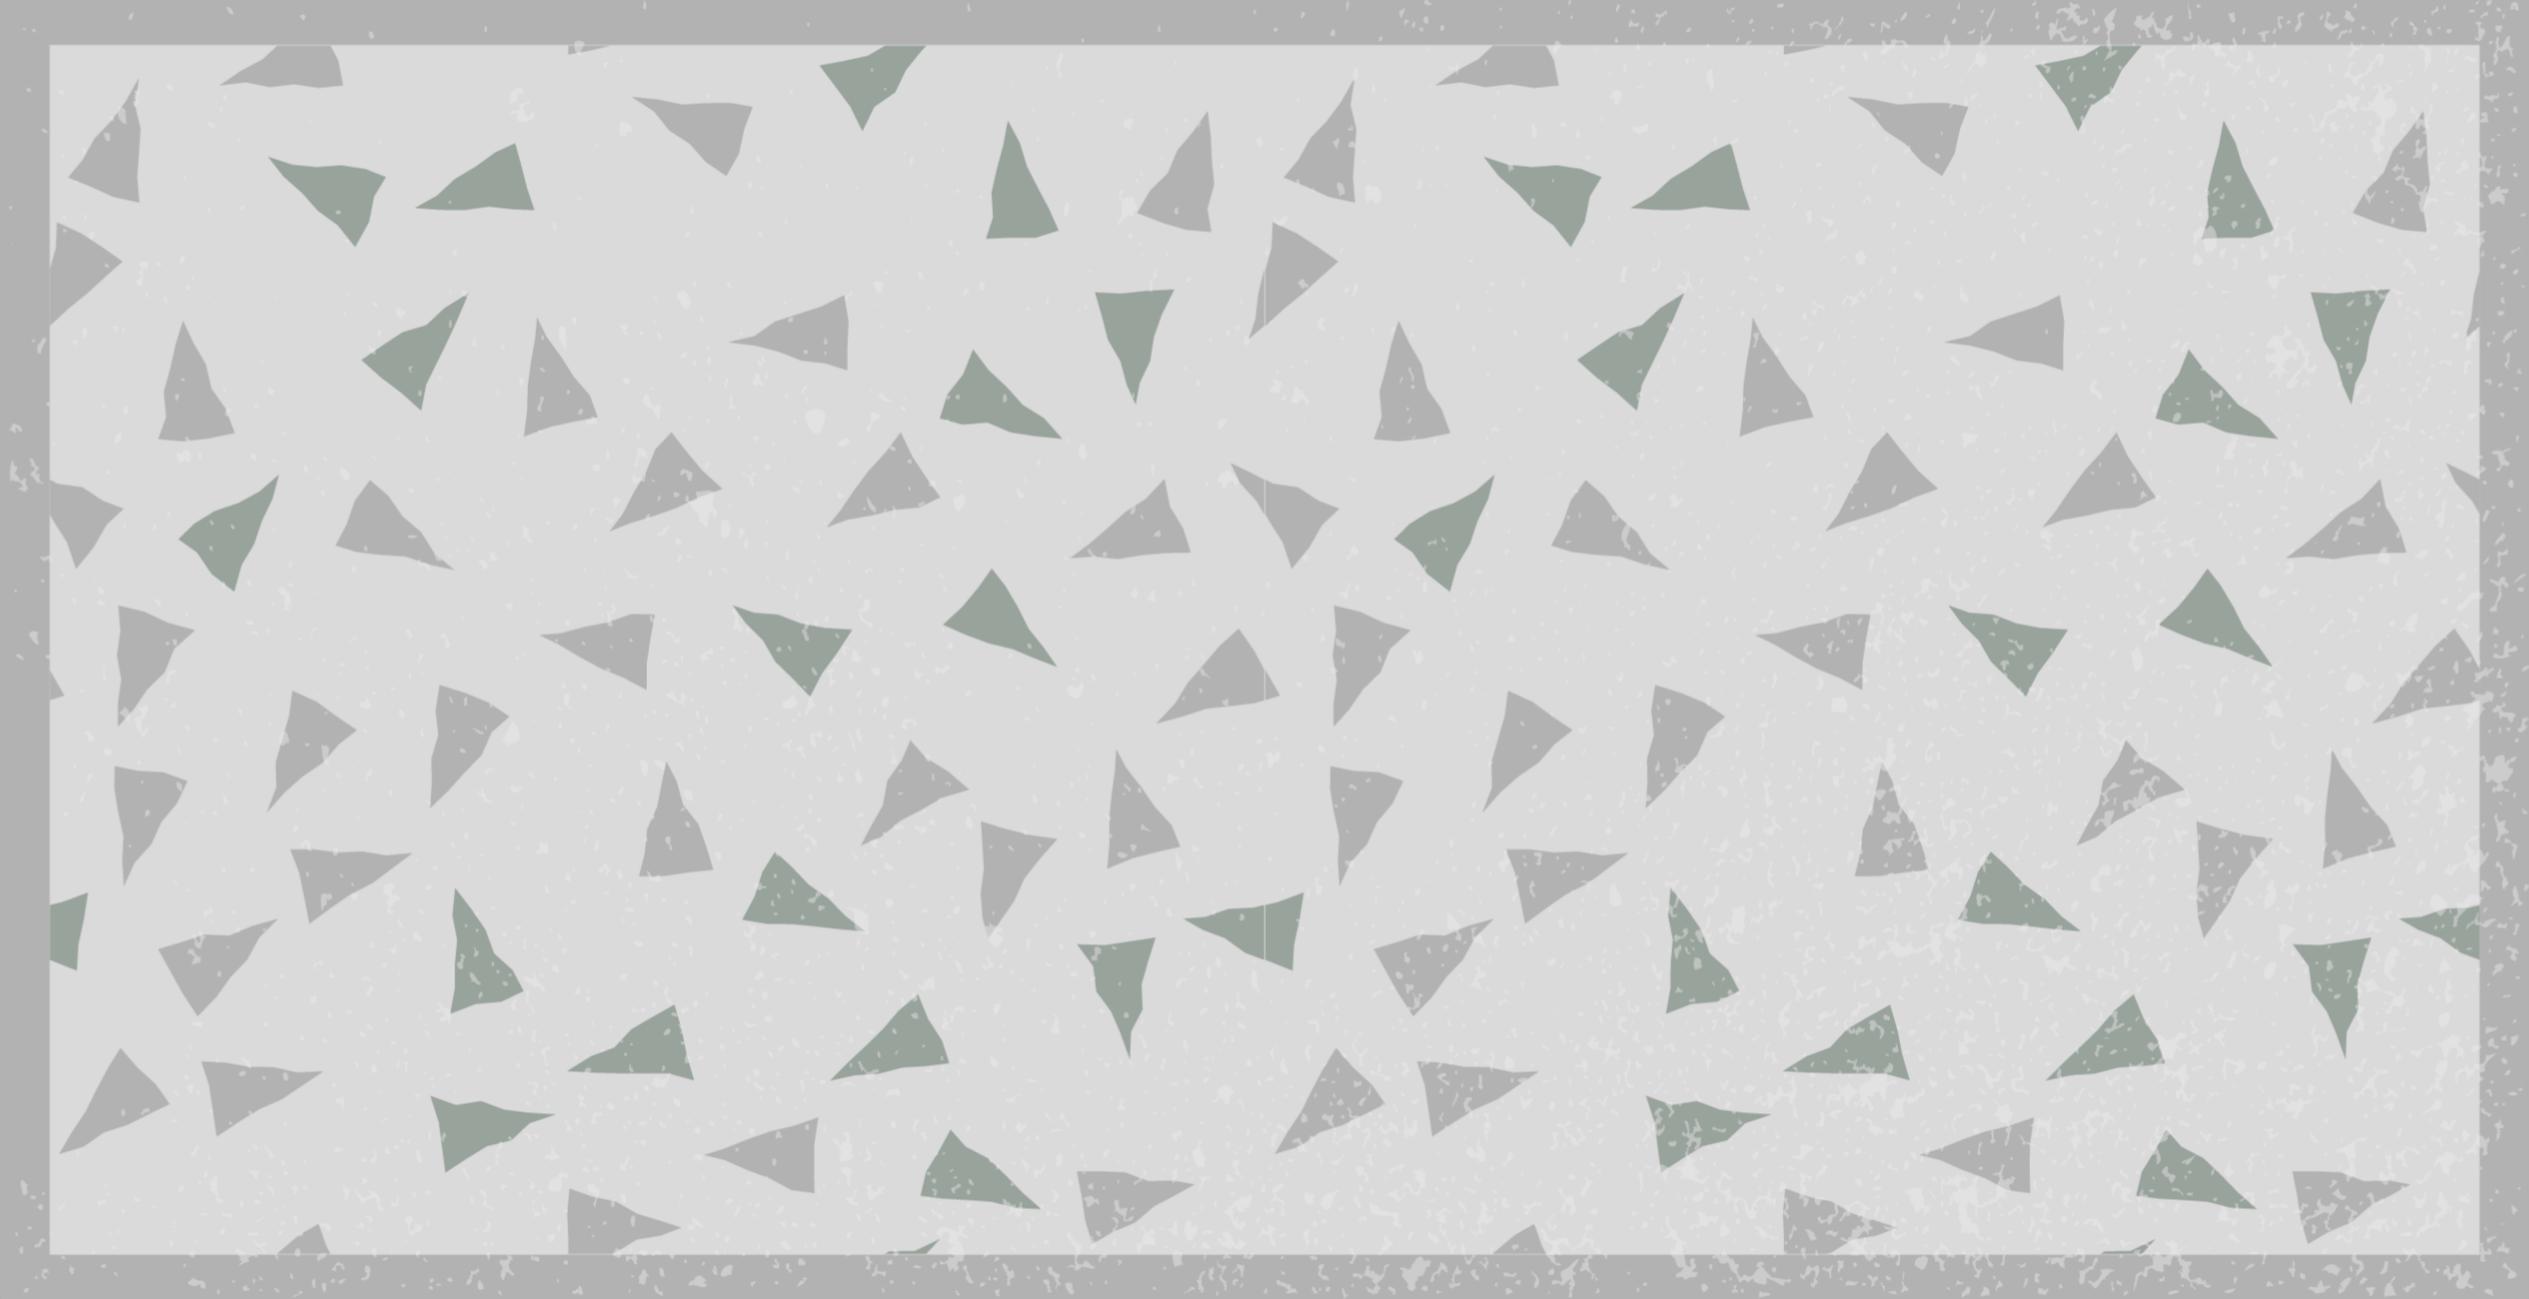 TenStickers. 轻巧的北欧风格北欧风格地毯. 您想用色彩鲜艳,光线柔和且简单的mordic风格装饰的乙烯基地毯来装饰您的房屋吗?停止寻找,因为您已经到达这里。